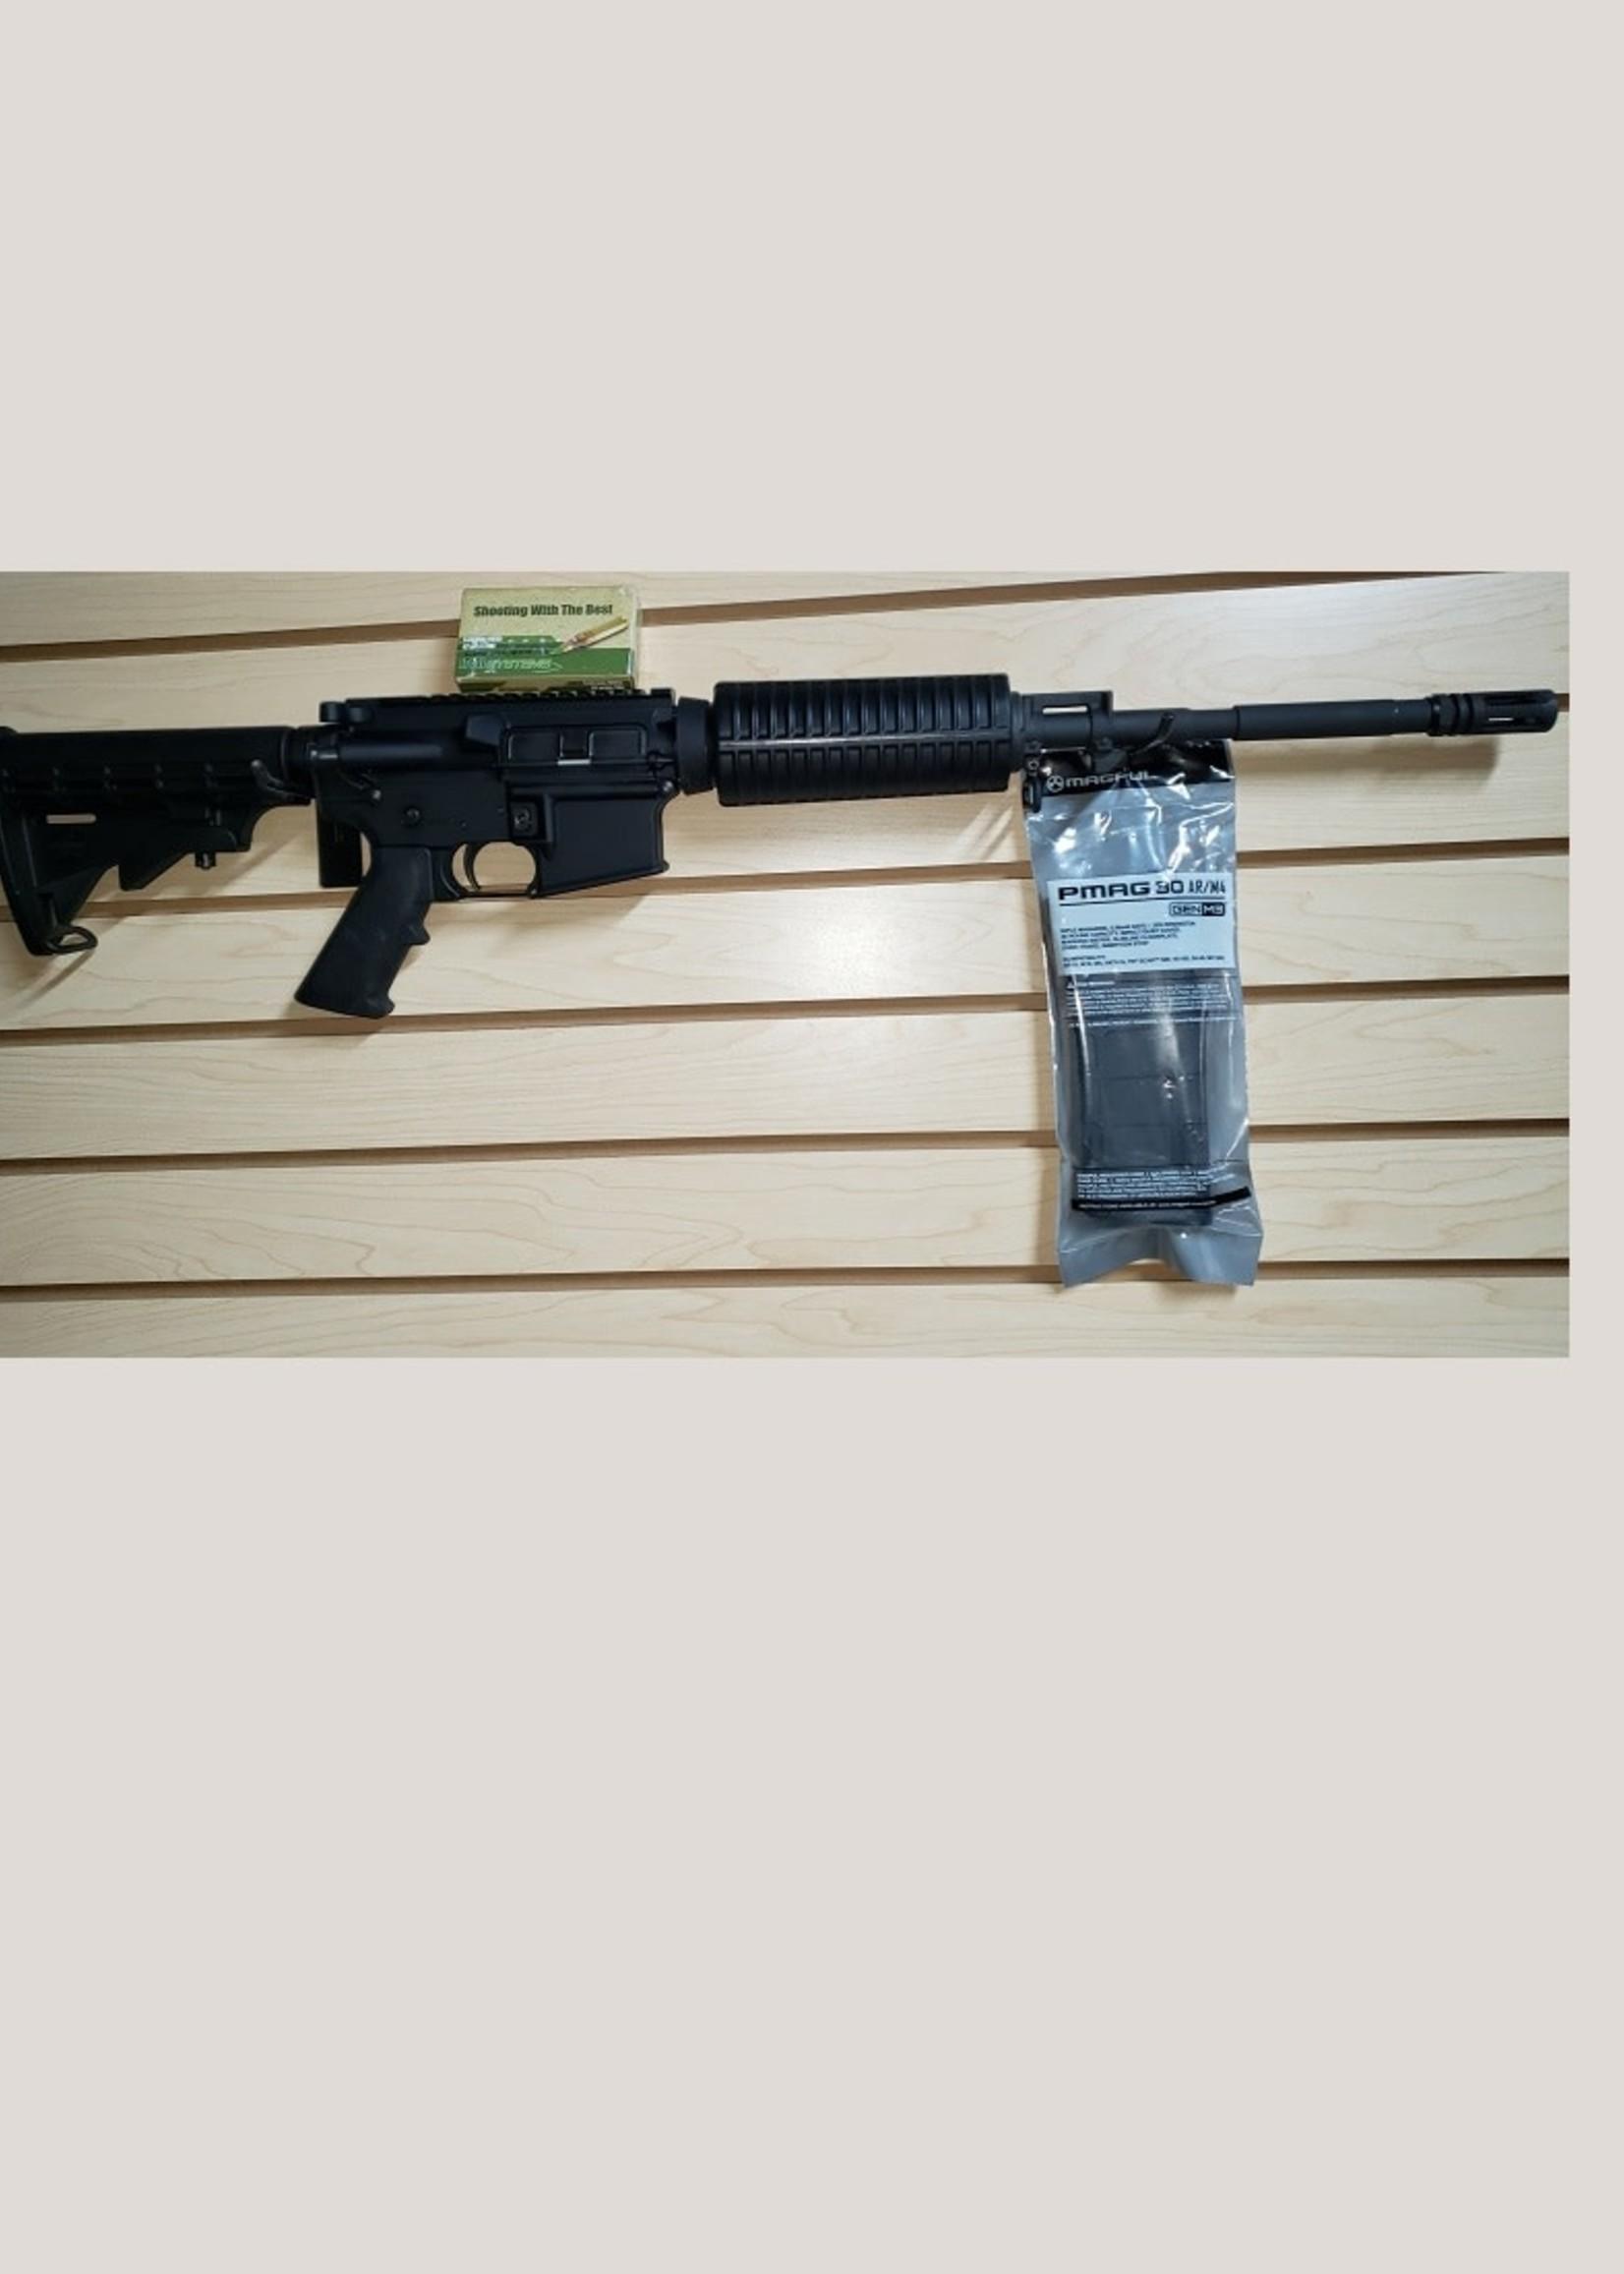 Bushmaster Bushmaster XM15-E2S, 5.56 Carbine